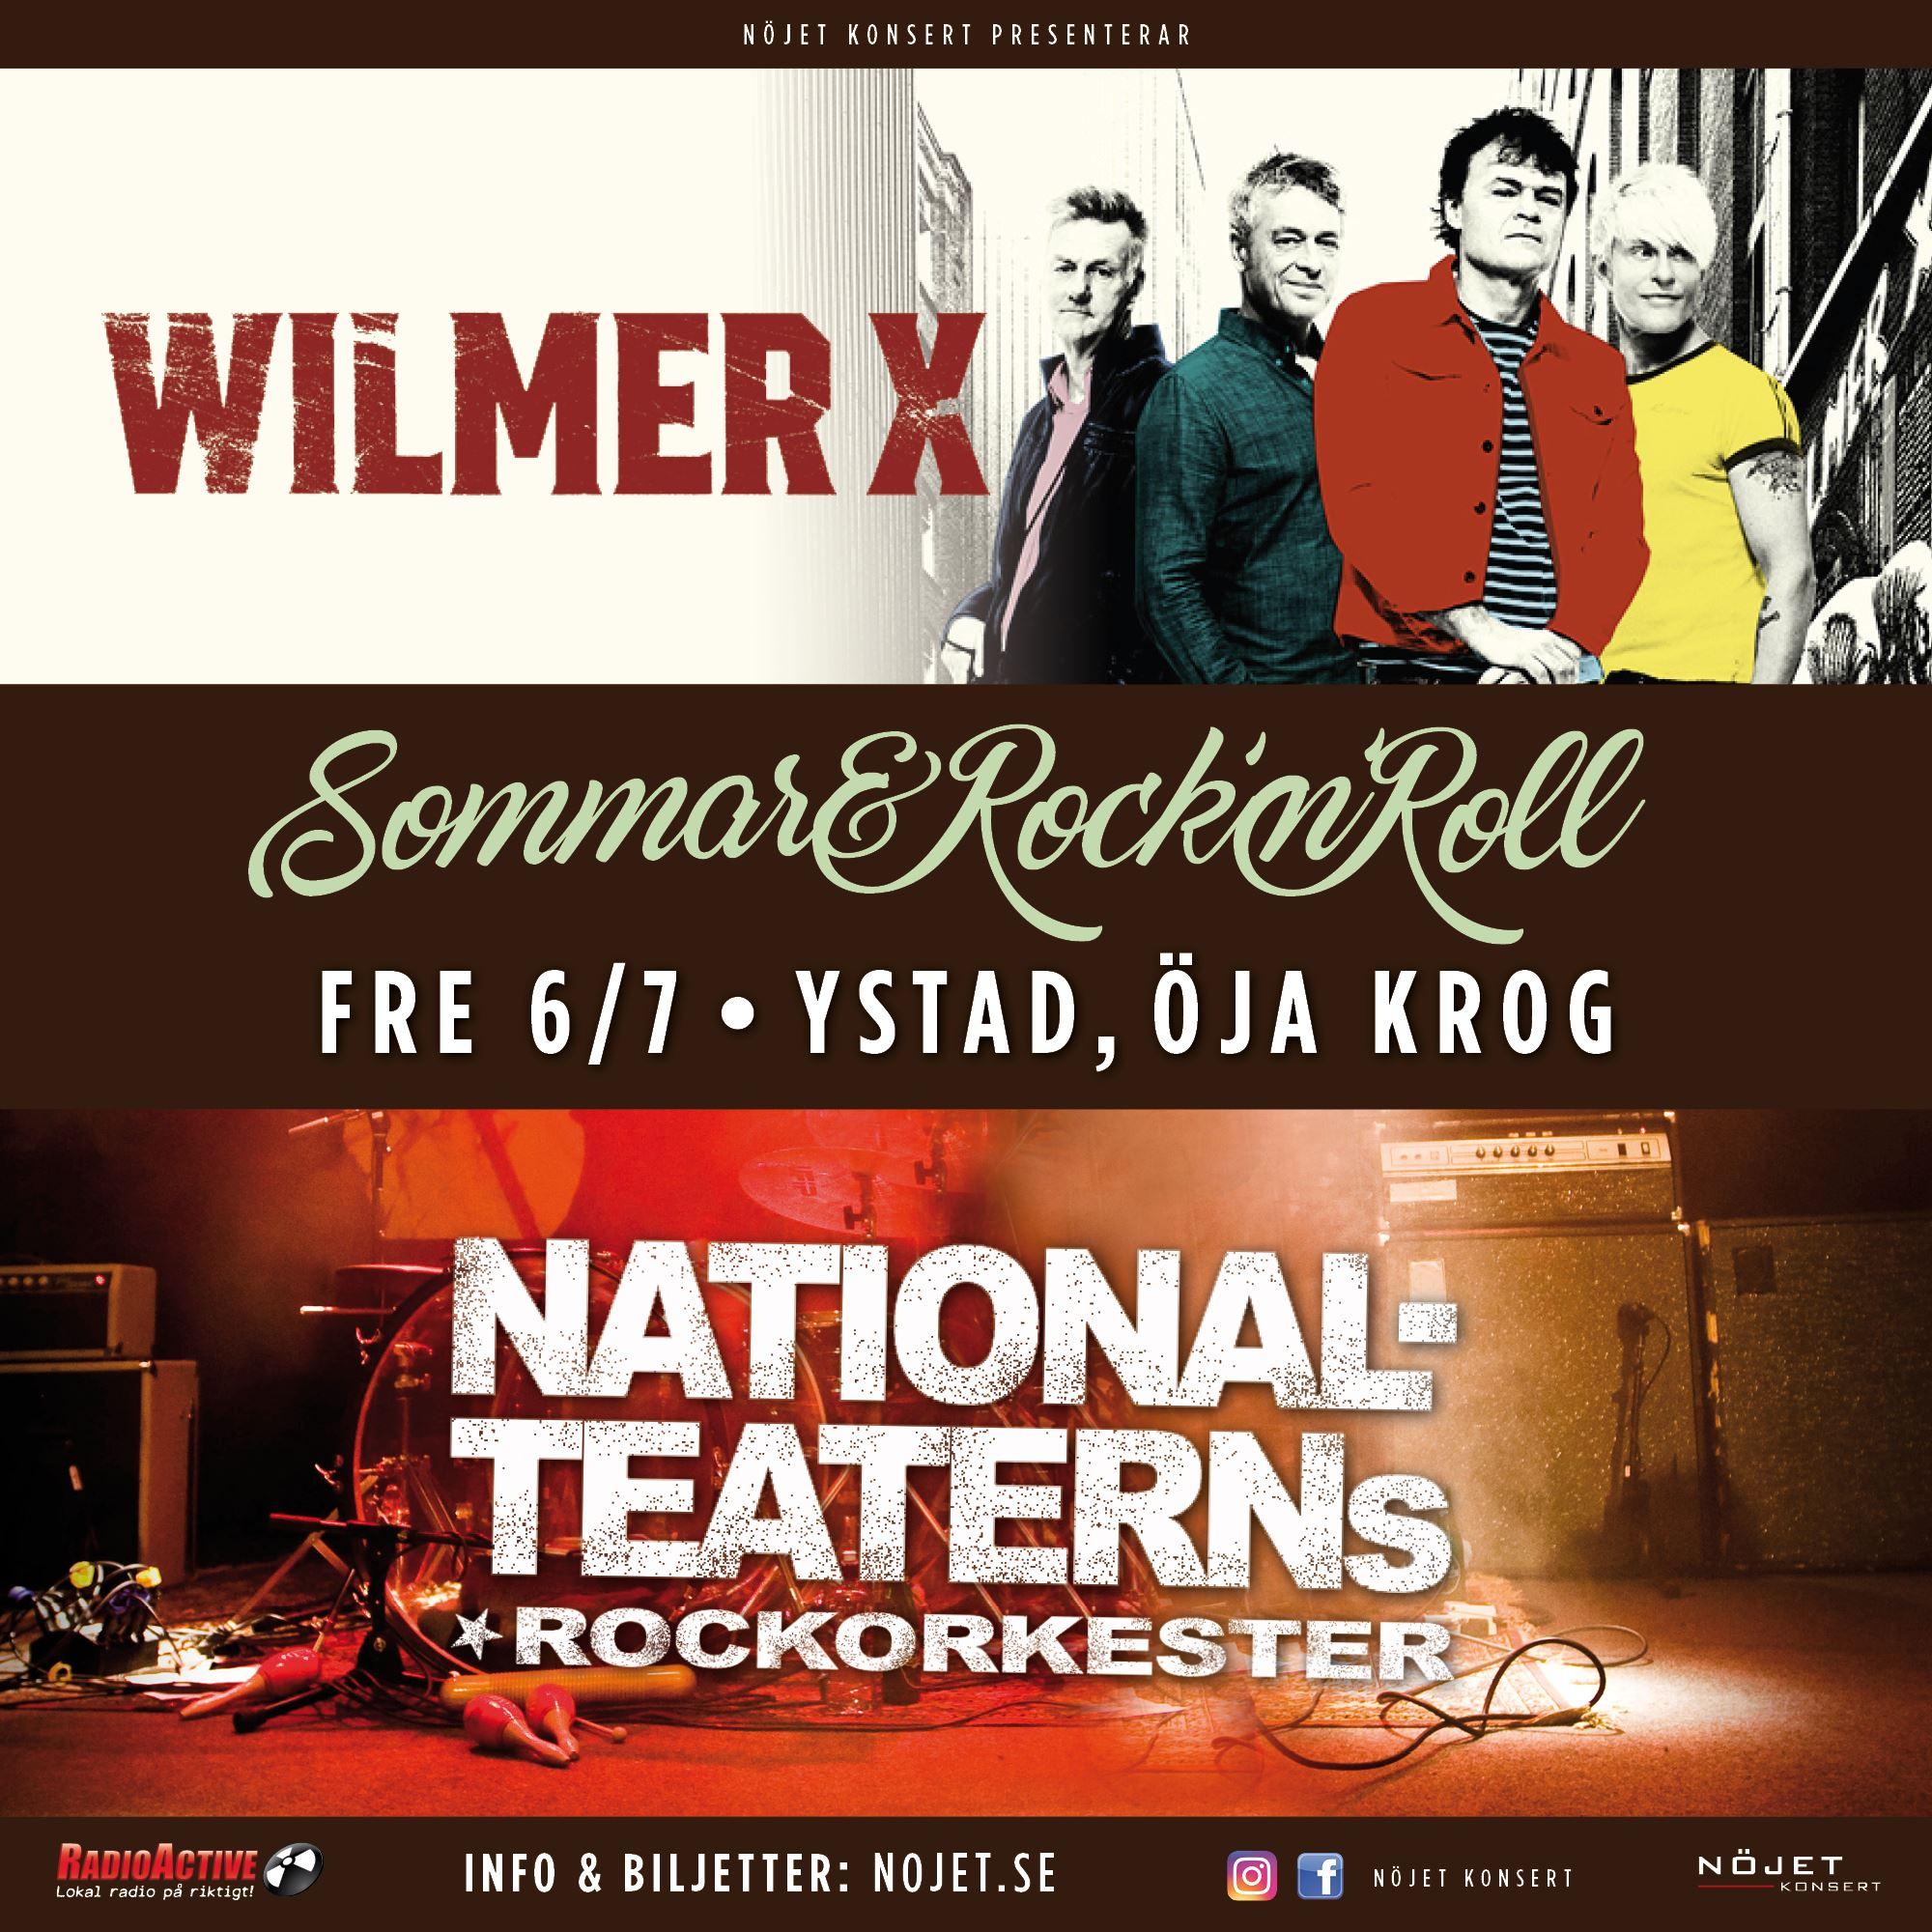 Nationalteaterns Rockorkester & Wilmer X på Öja Krog